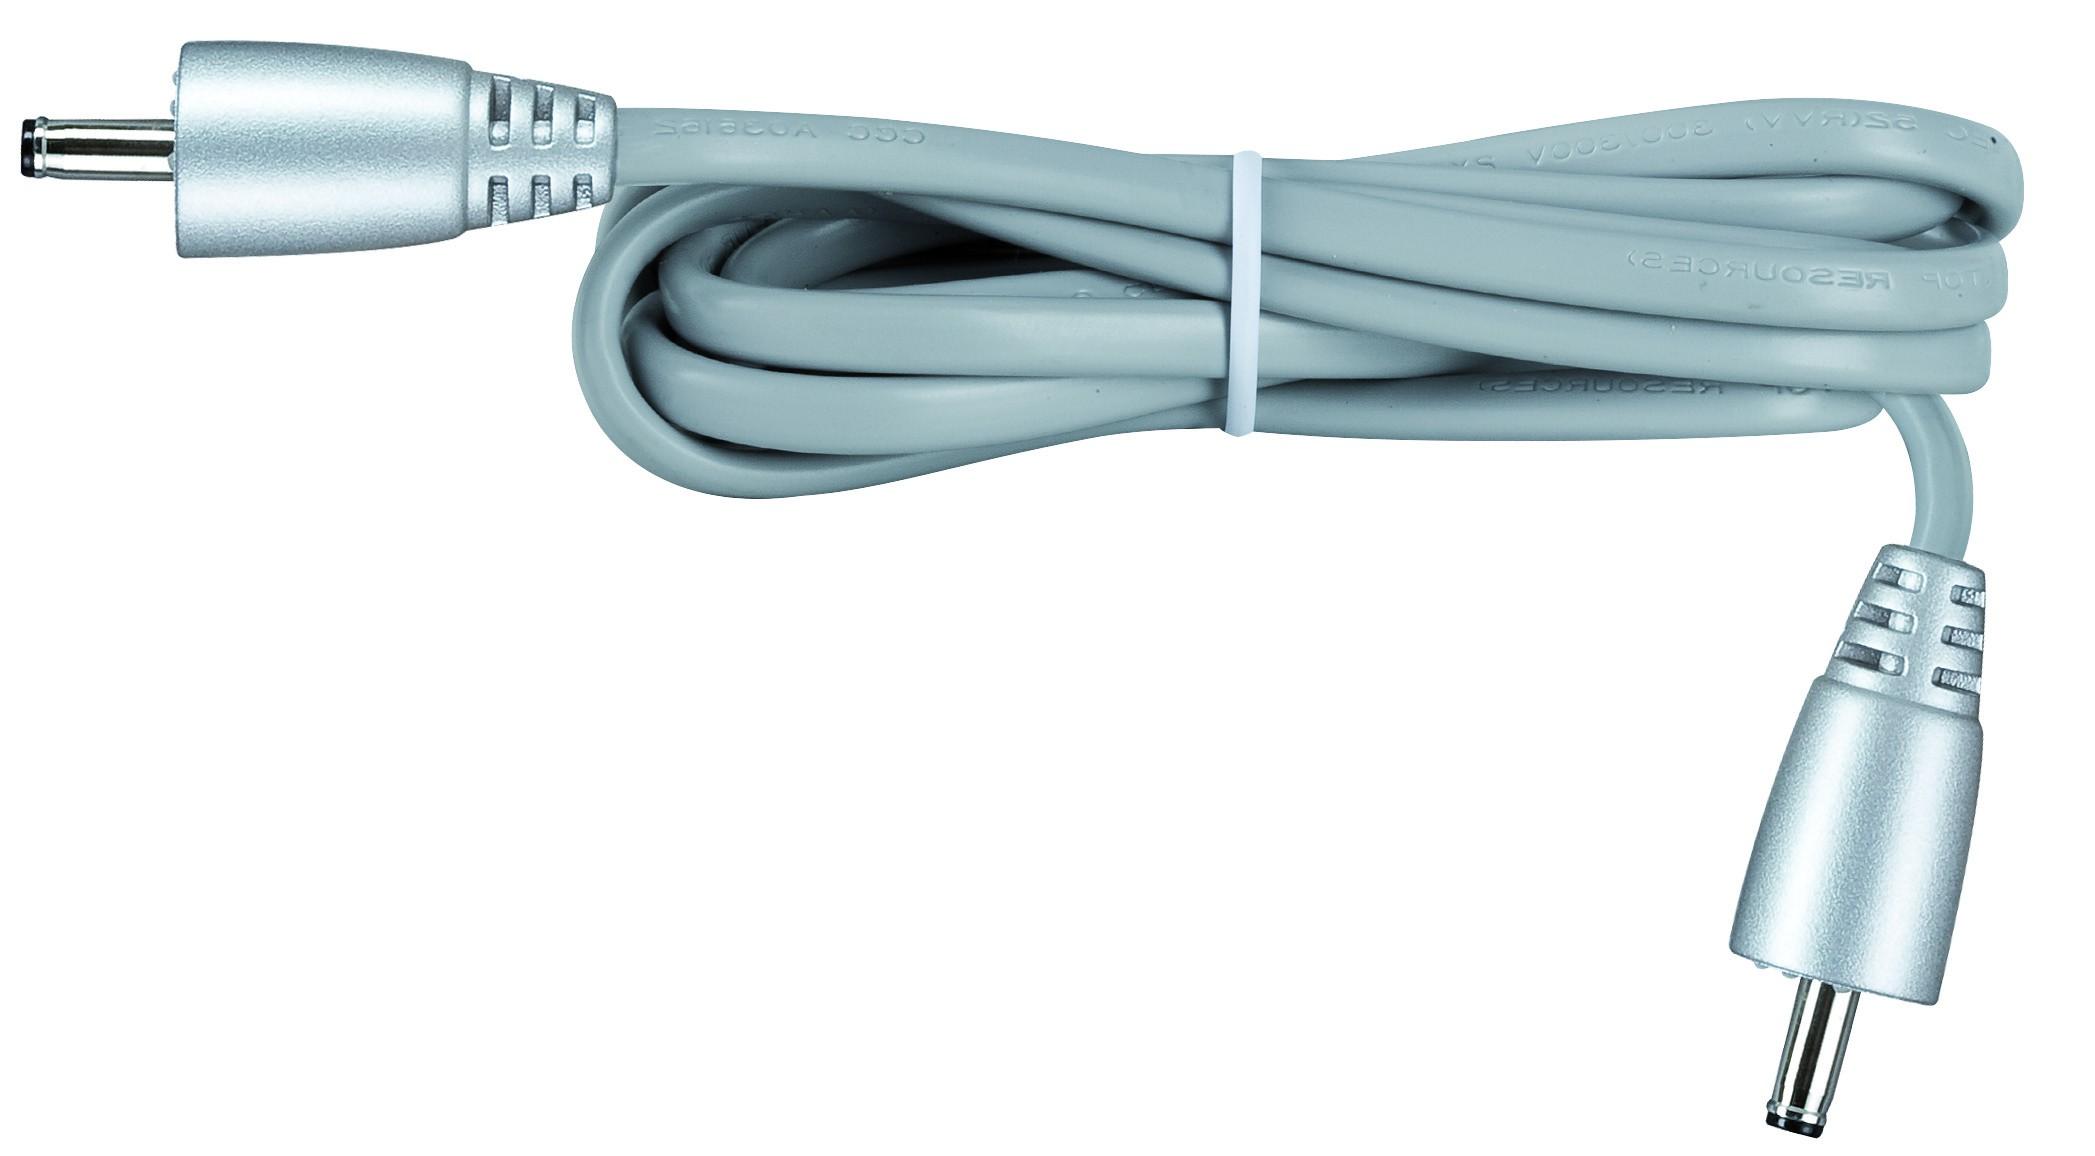 paulmann moduled function moduled wire 1 5m chrom matt kunststoff metall leuchten. Black Bedroom Furniture Sets. Home Design Ideas